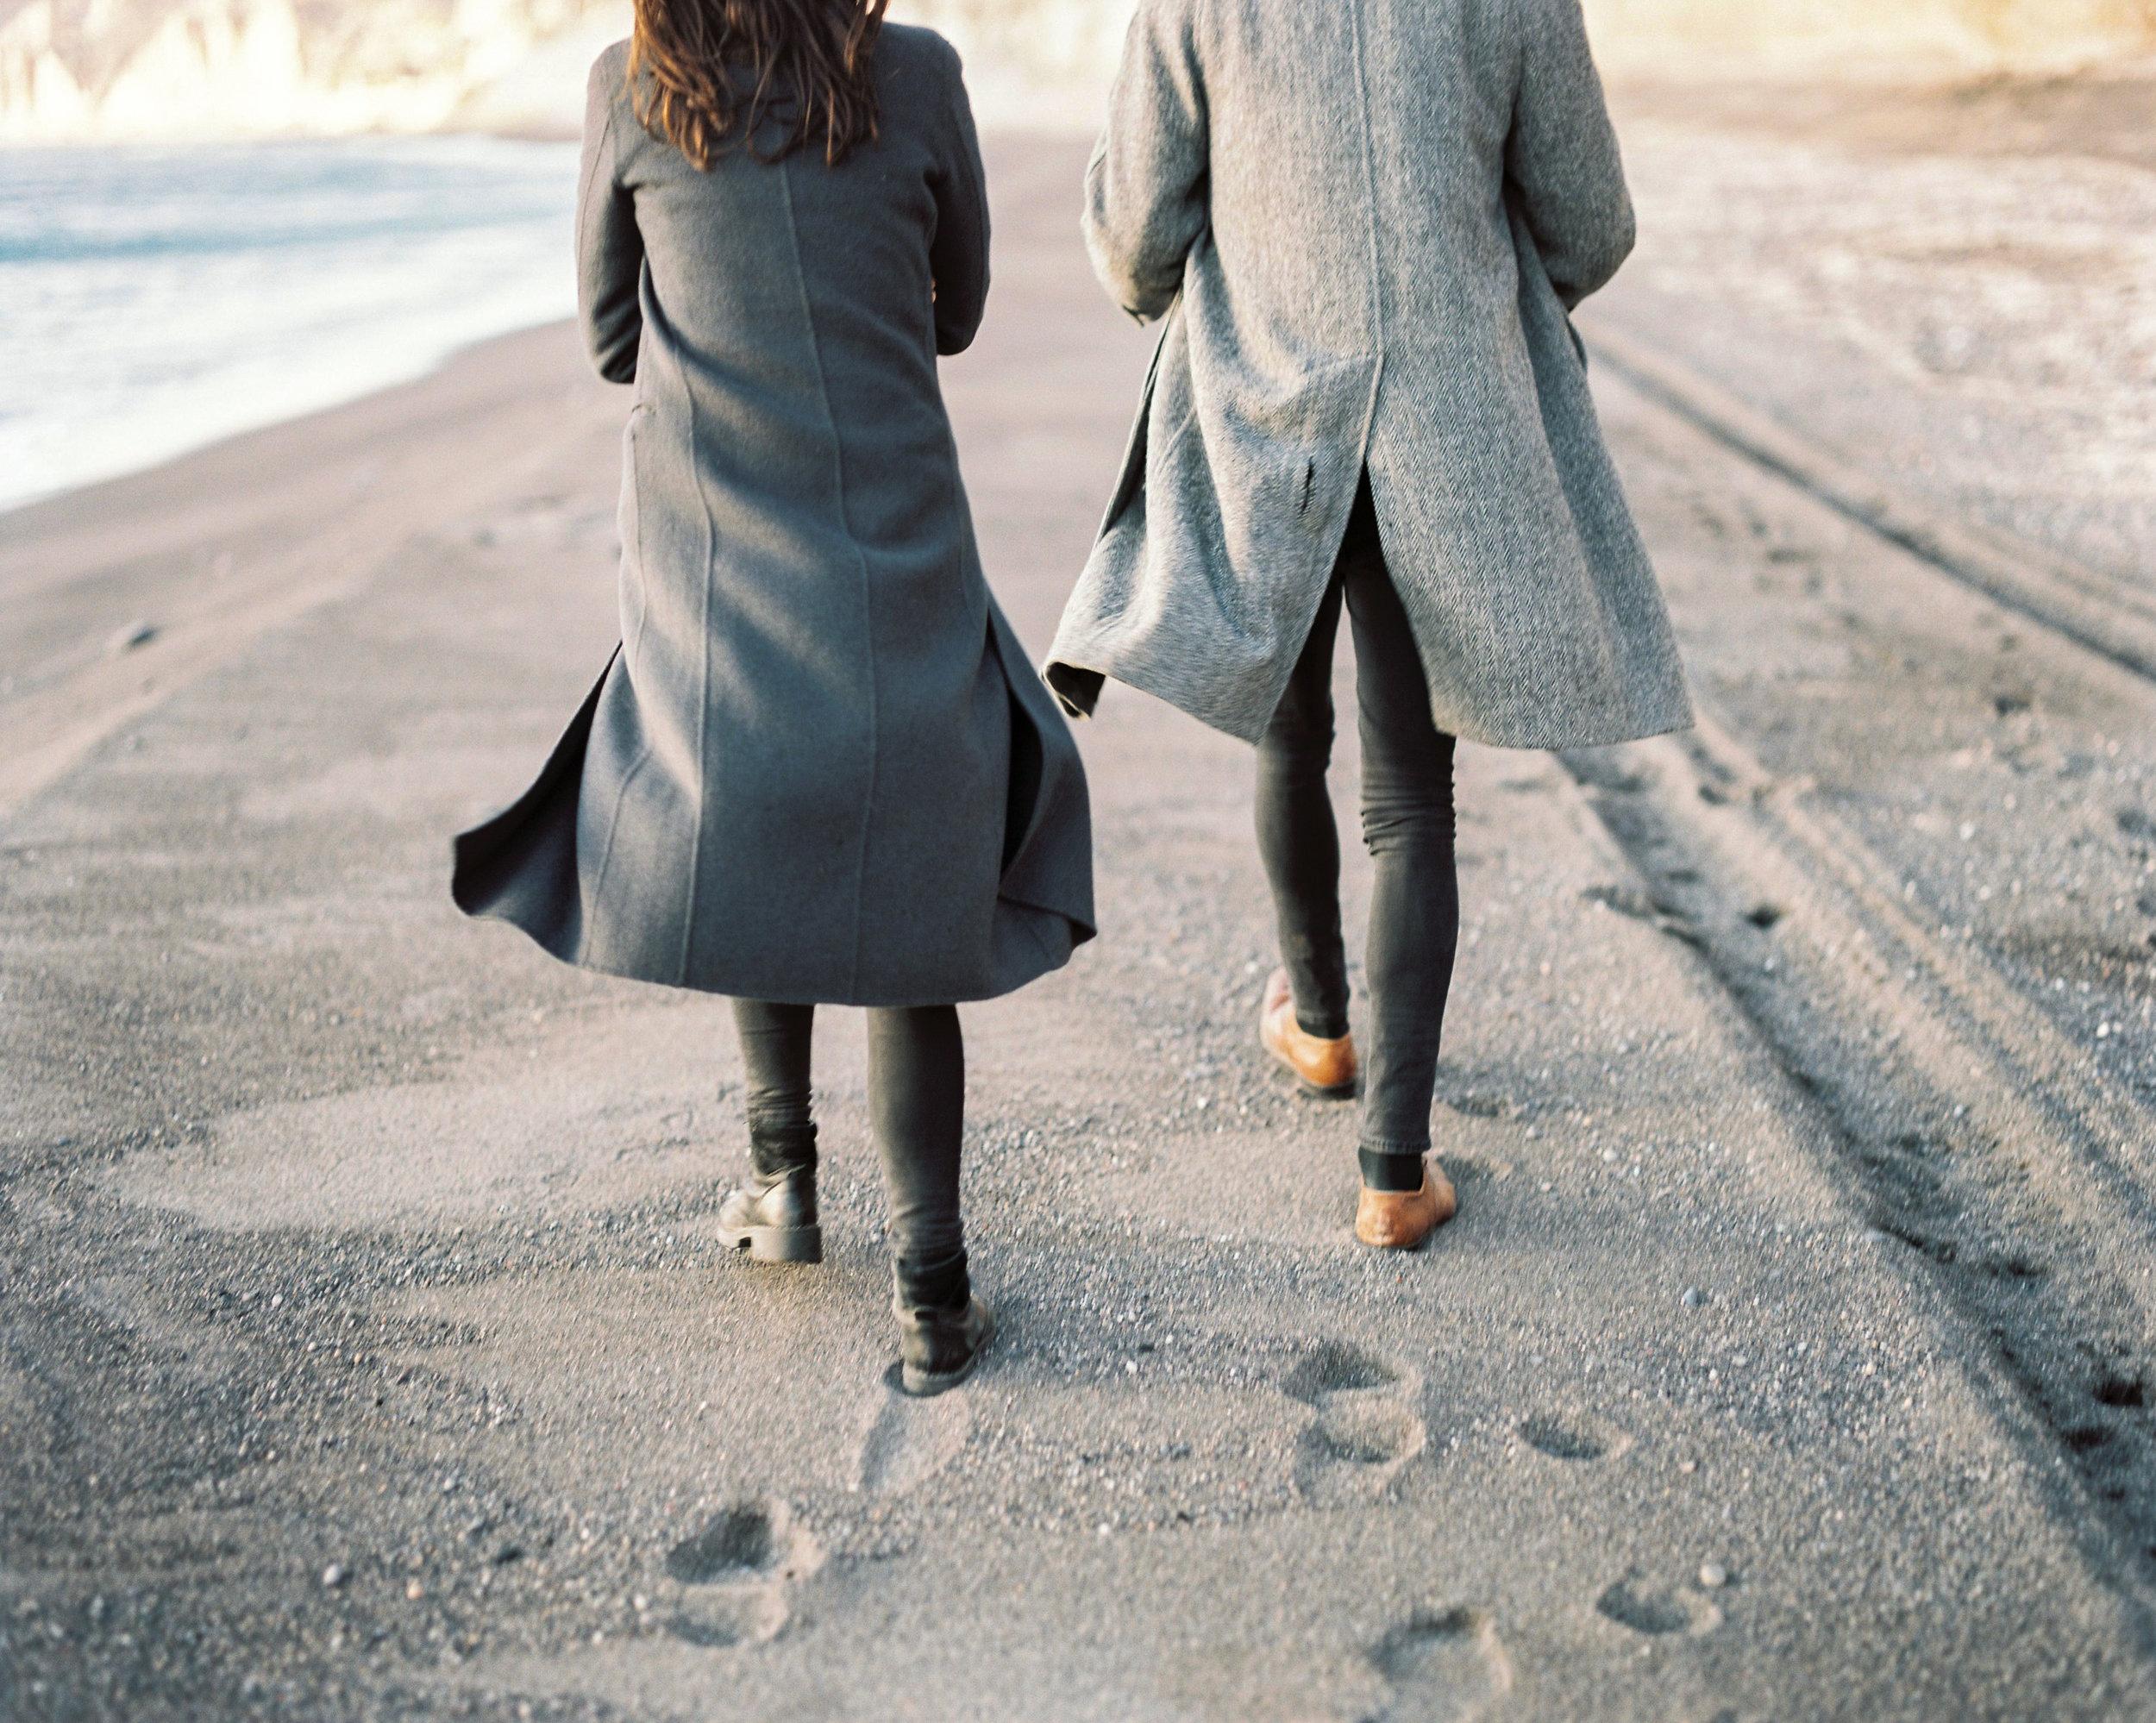 celinehamelin-photographe-couple-argentique-loversession-grece-santorin-argentique-filmphotography-greece17.jpg